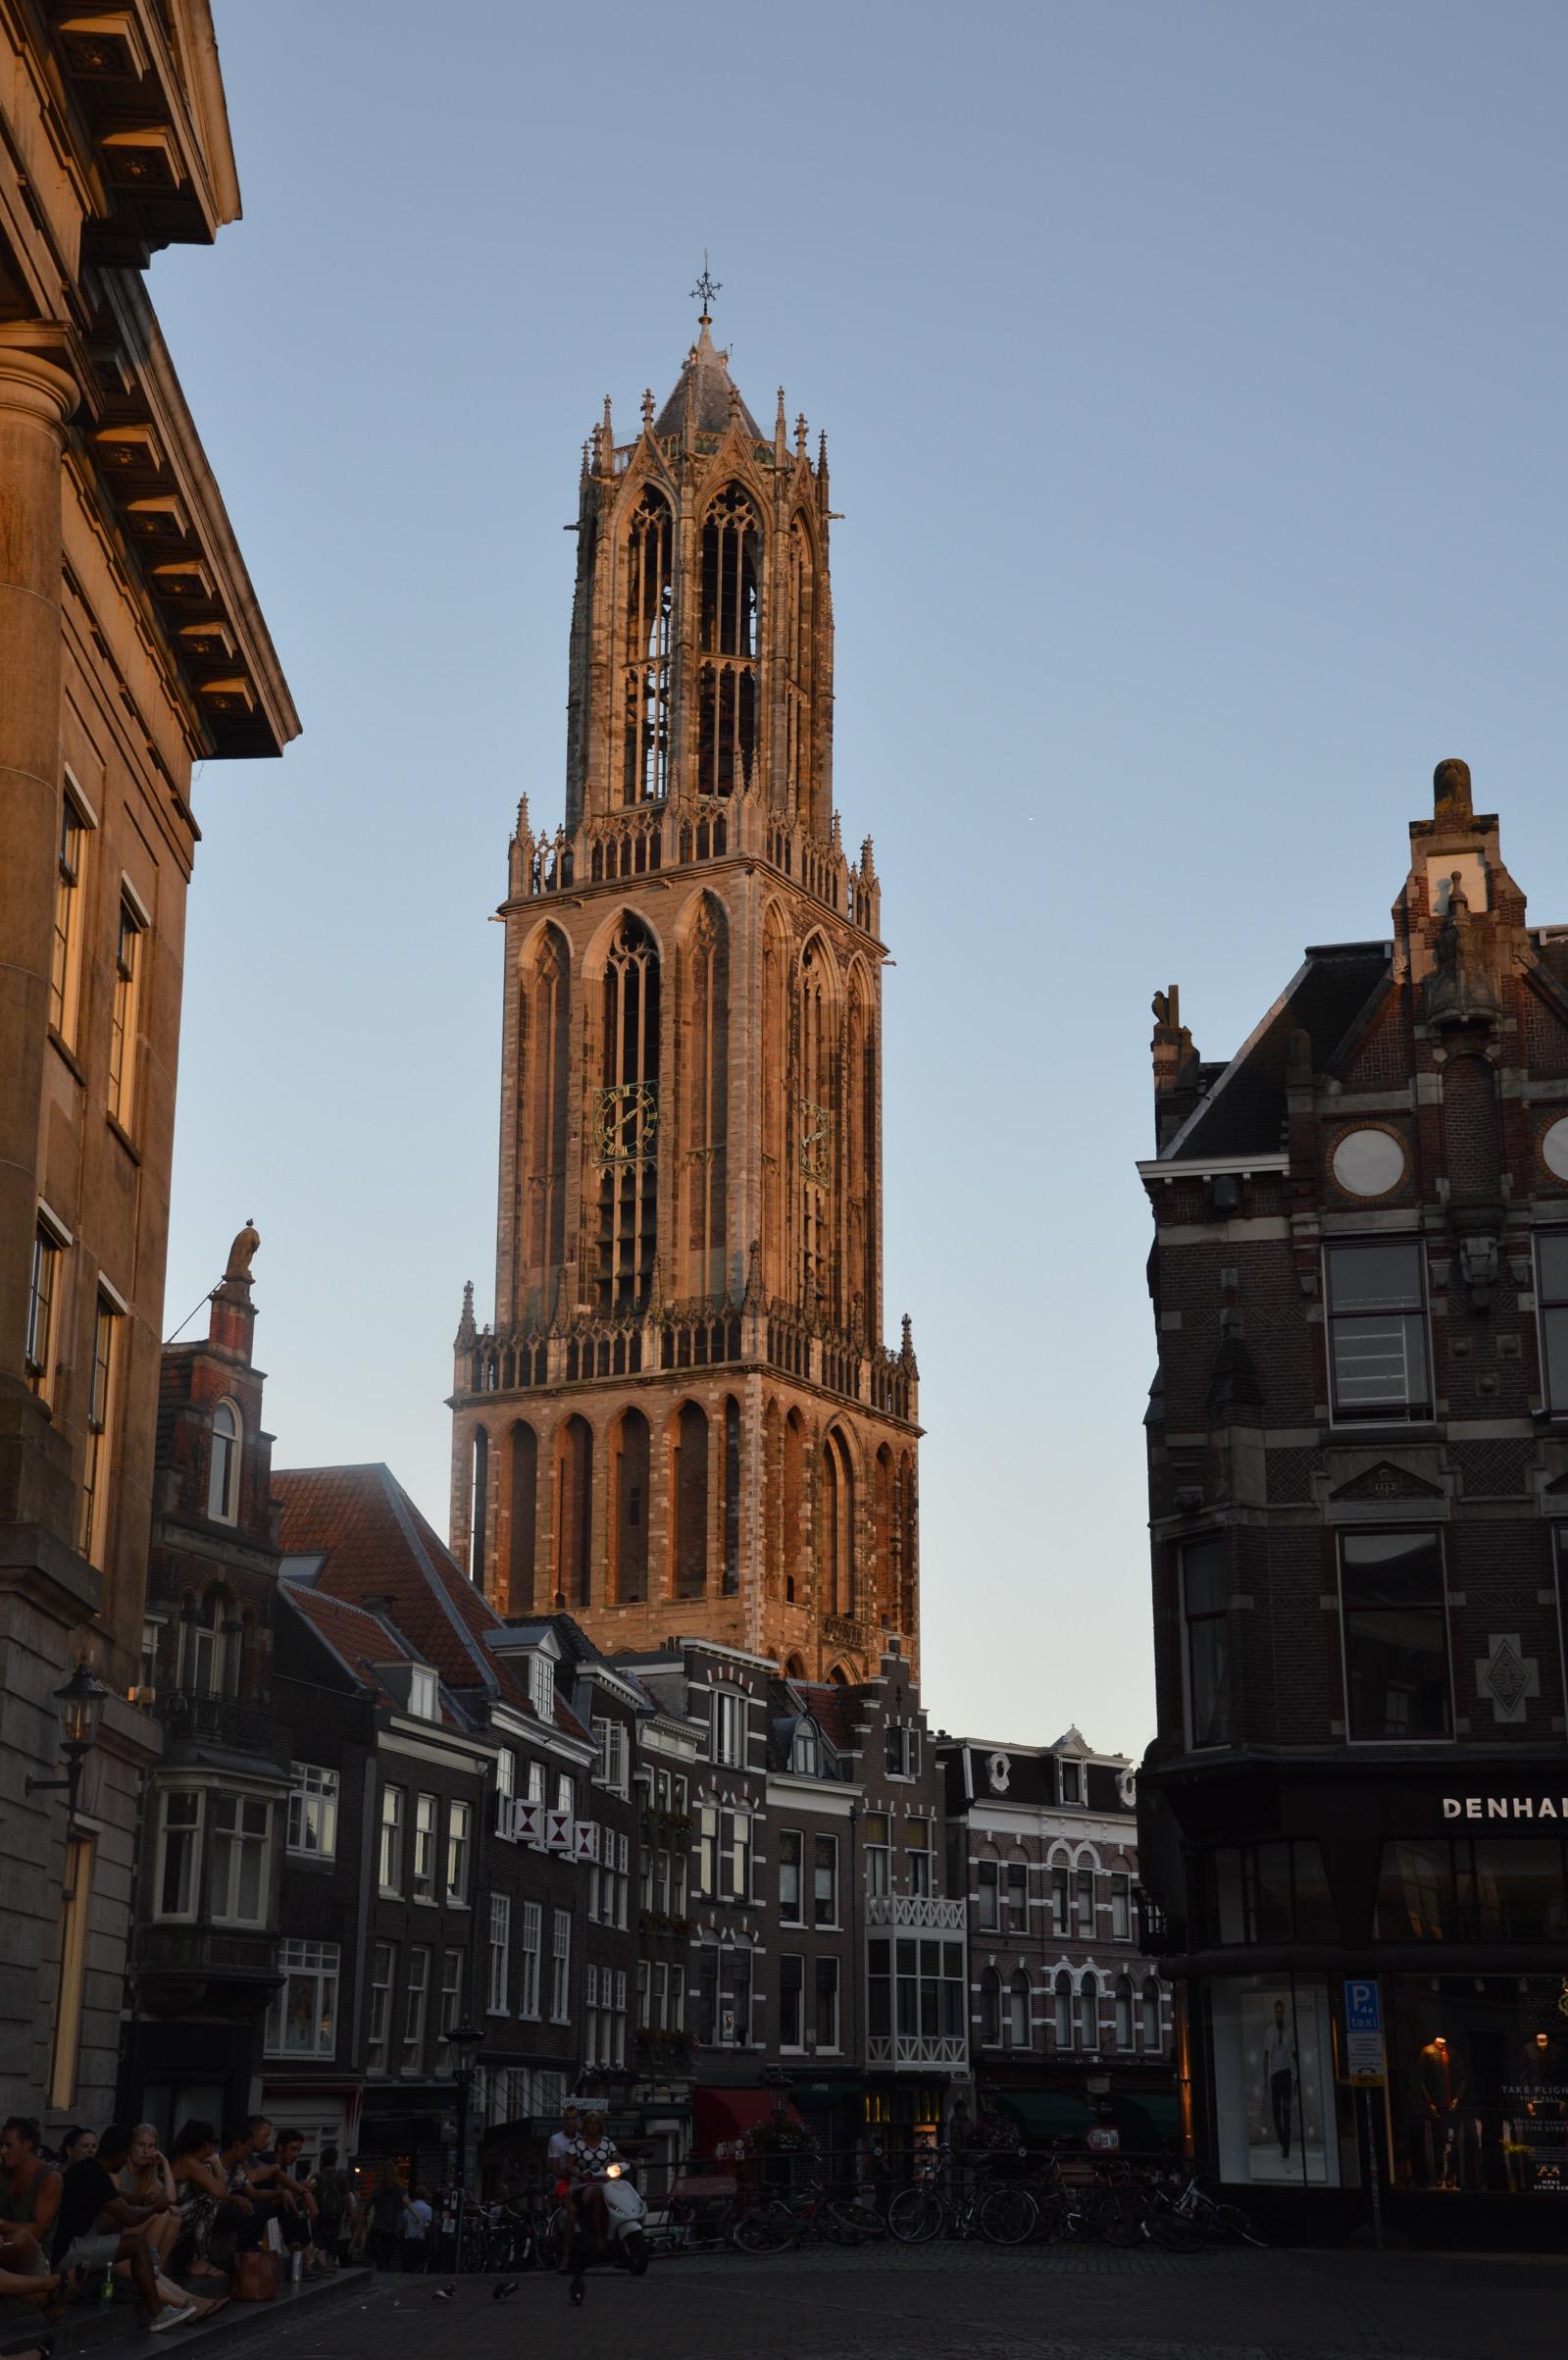 Dom Tower, Utrecht, the Netherlands